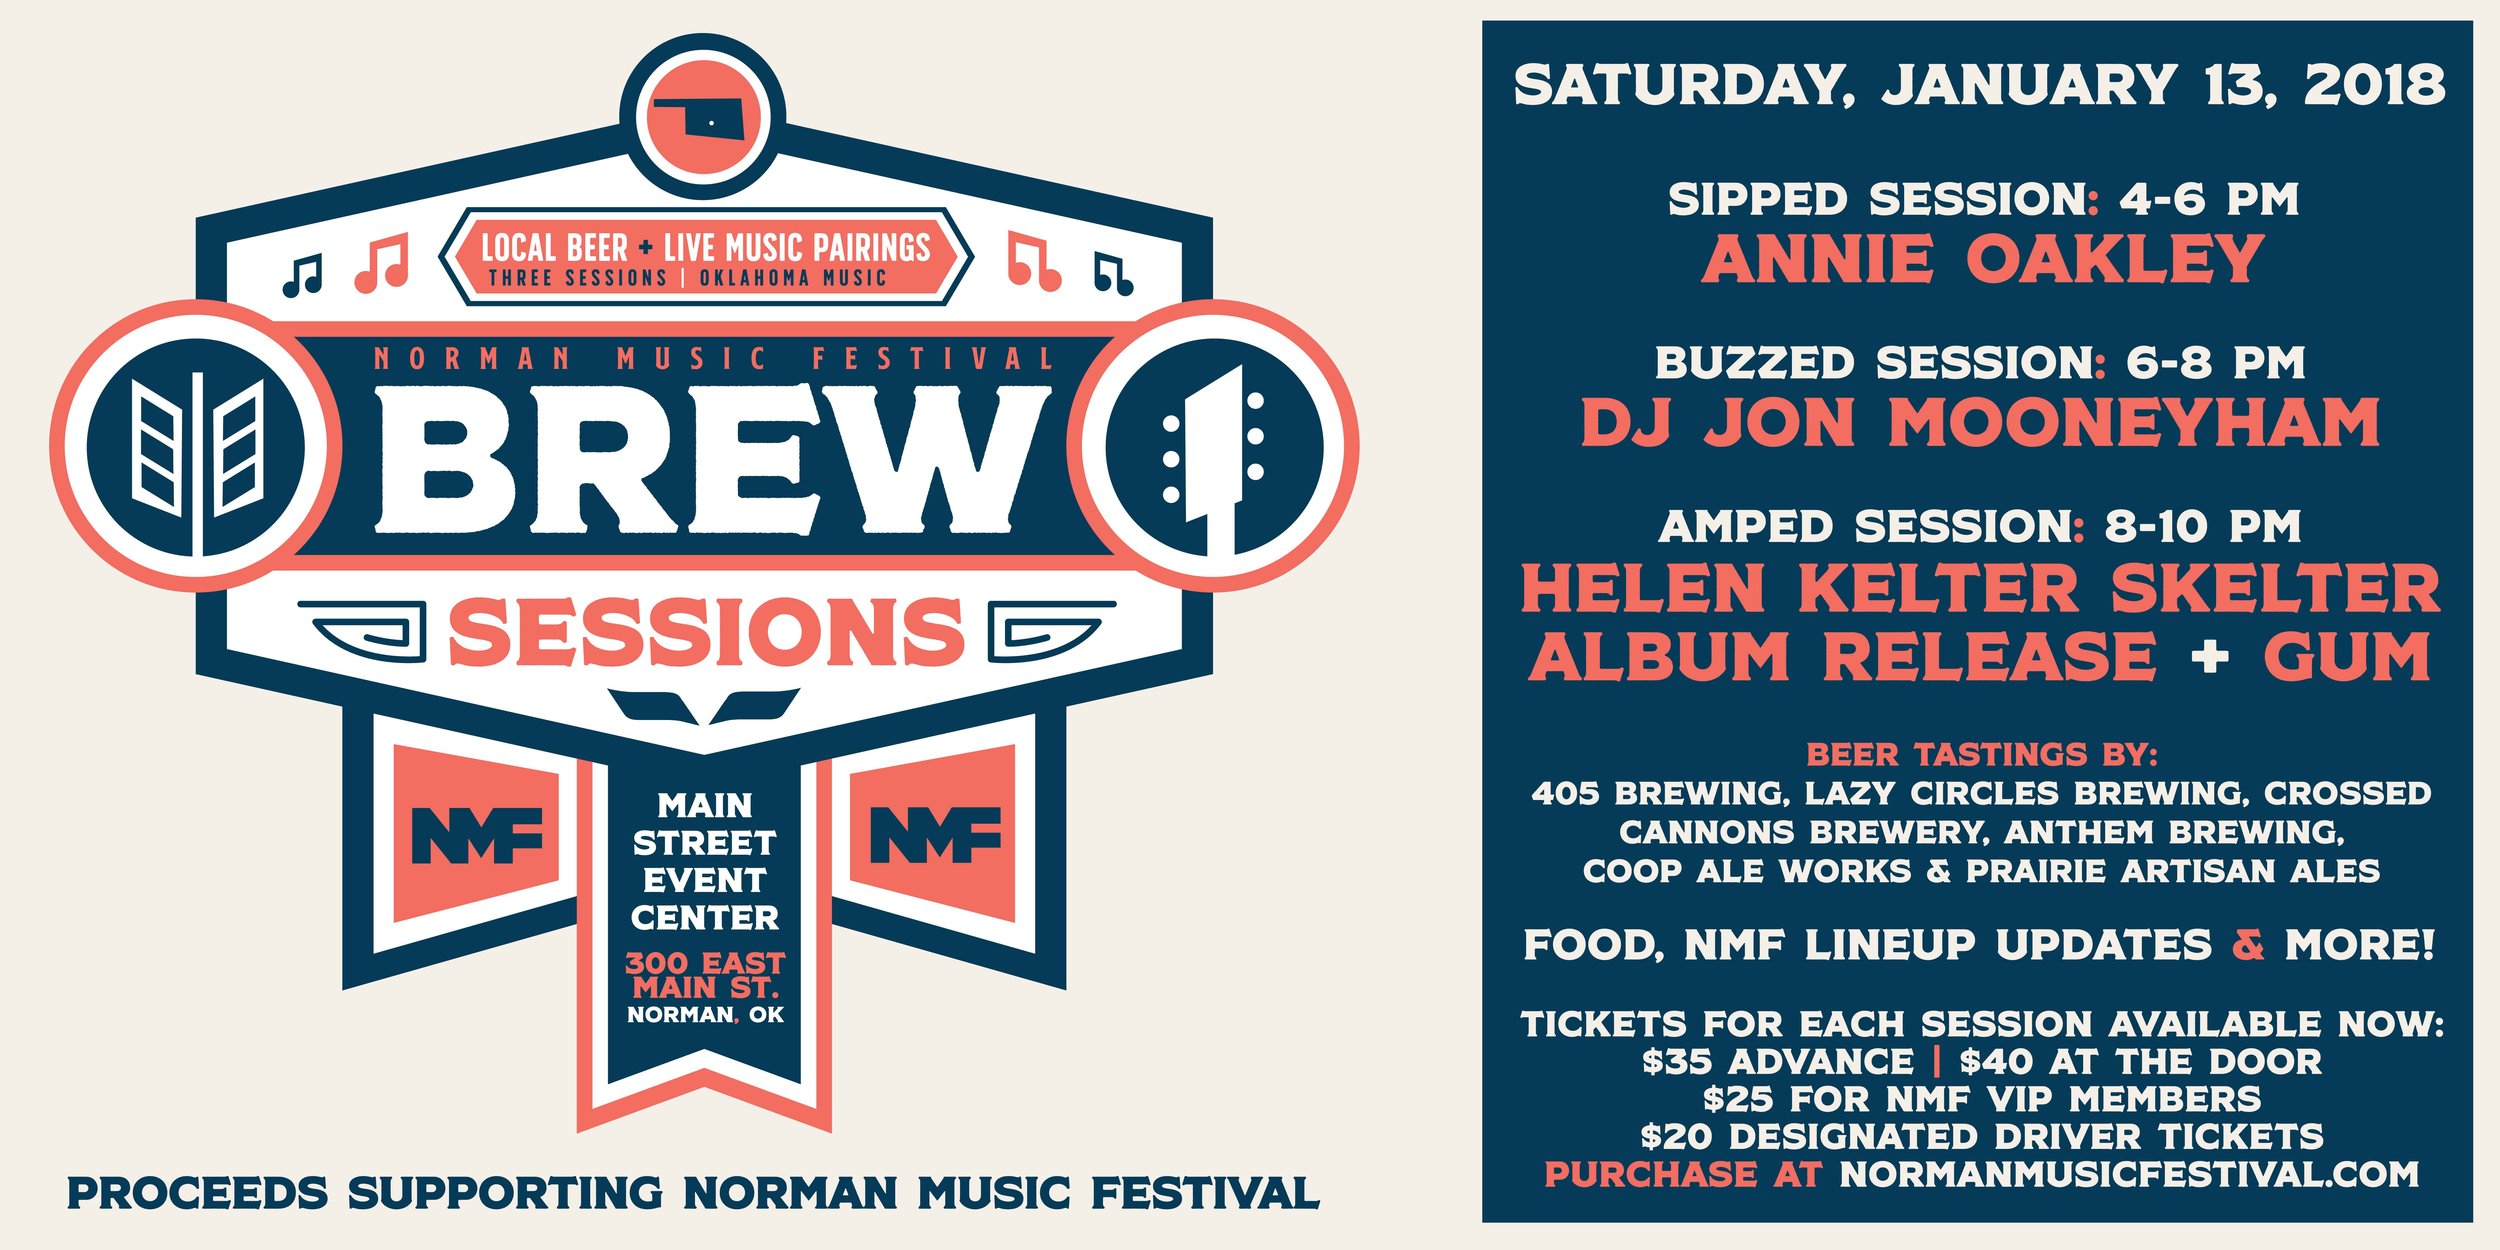 Brew Sessions Eventbrite-01.jpg